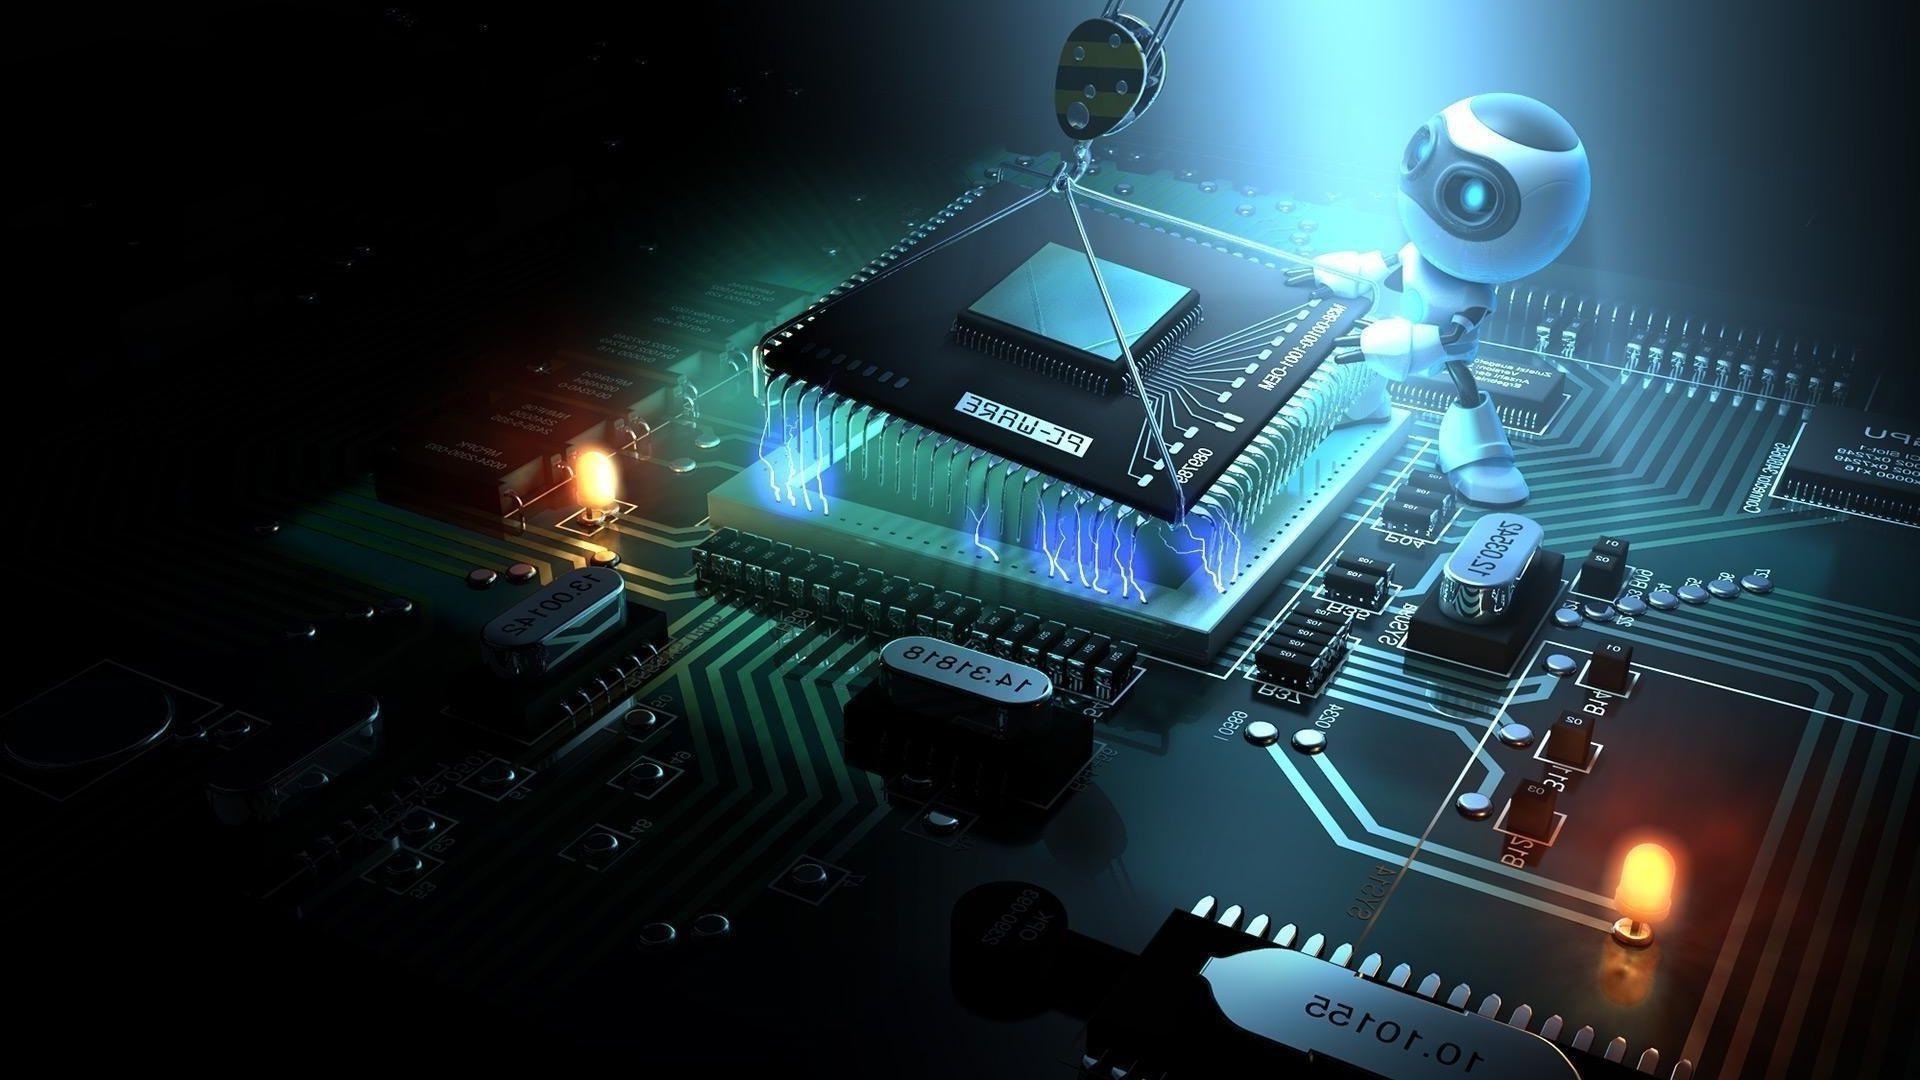 Electronics Manufacturing Services | Contract Manufacturing Company  Vasai,Maharashtra|EMS,OEM,Jobwork Provider Mumbai|PCB Assembly,Laser  Marking,Injection Molding Mumbai